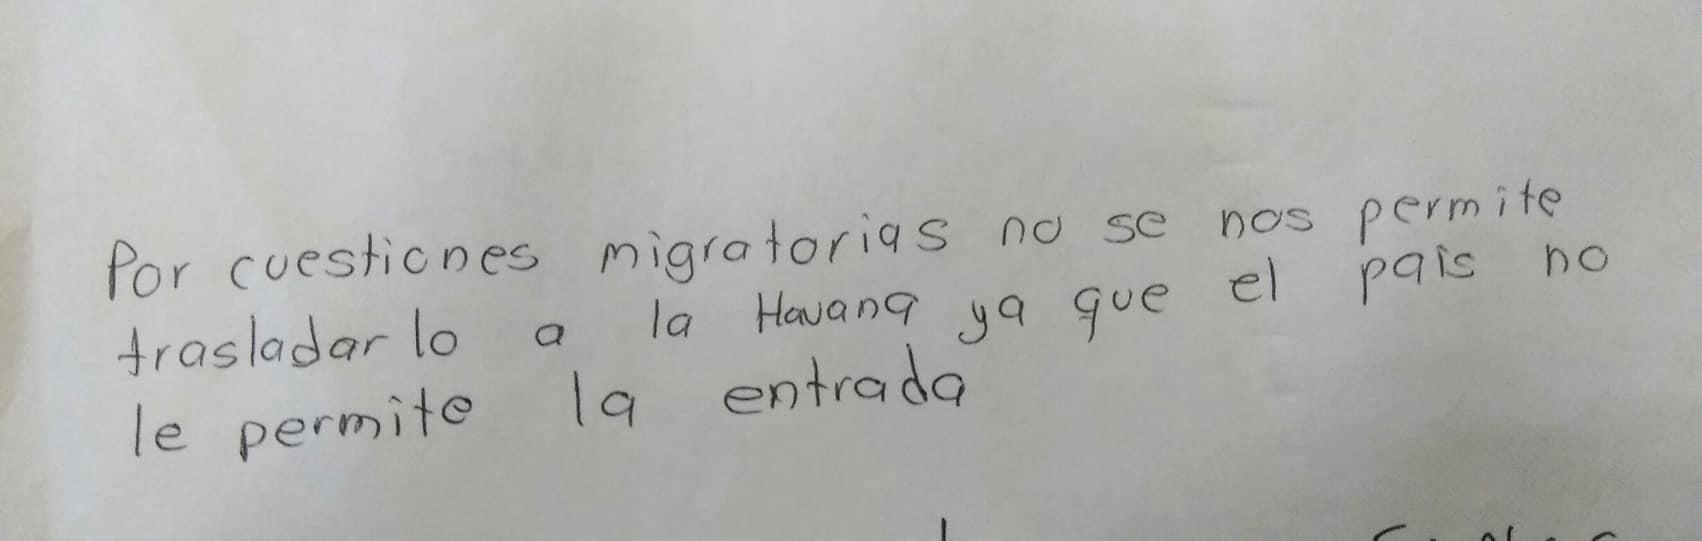 michael petrelis interjet note